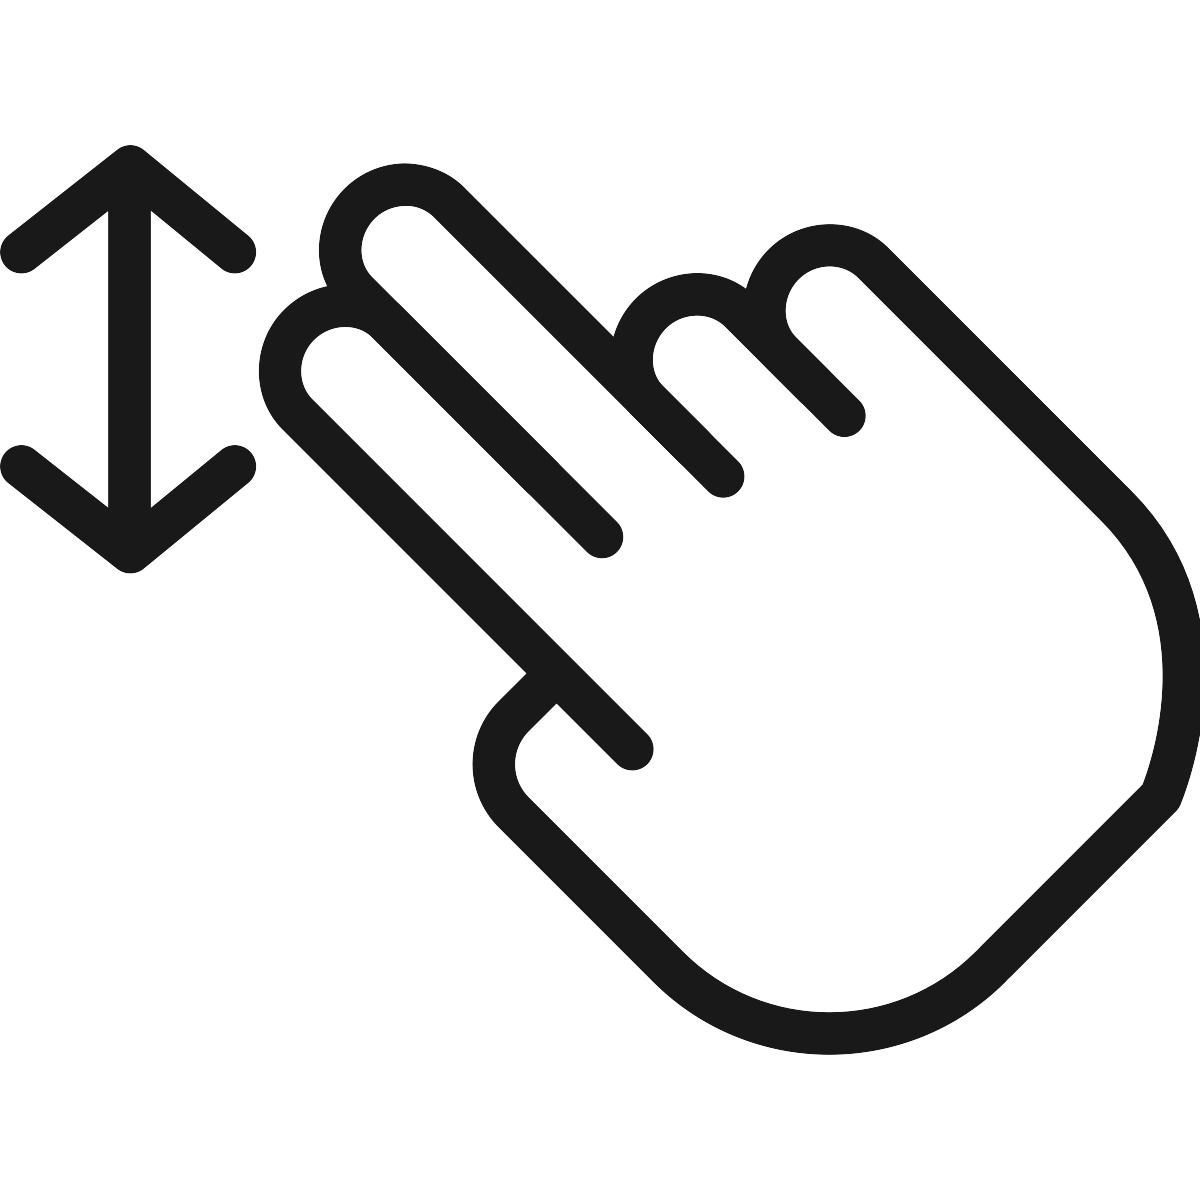 interaction_design_icon